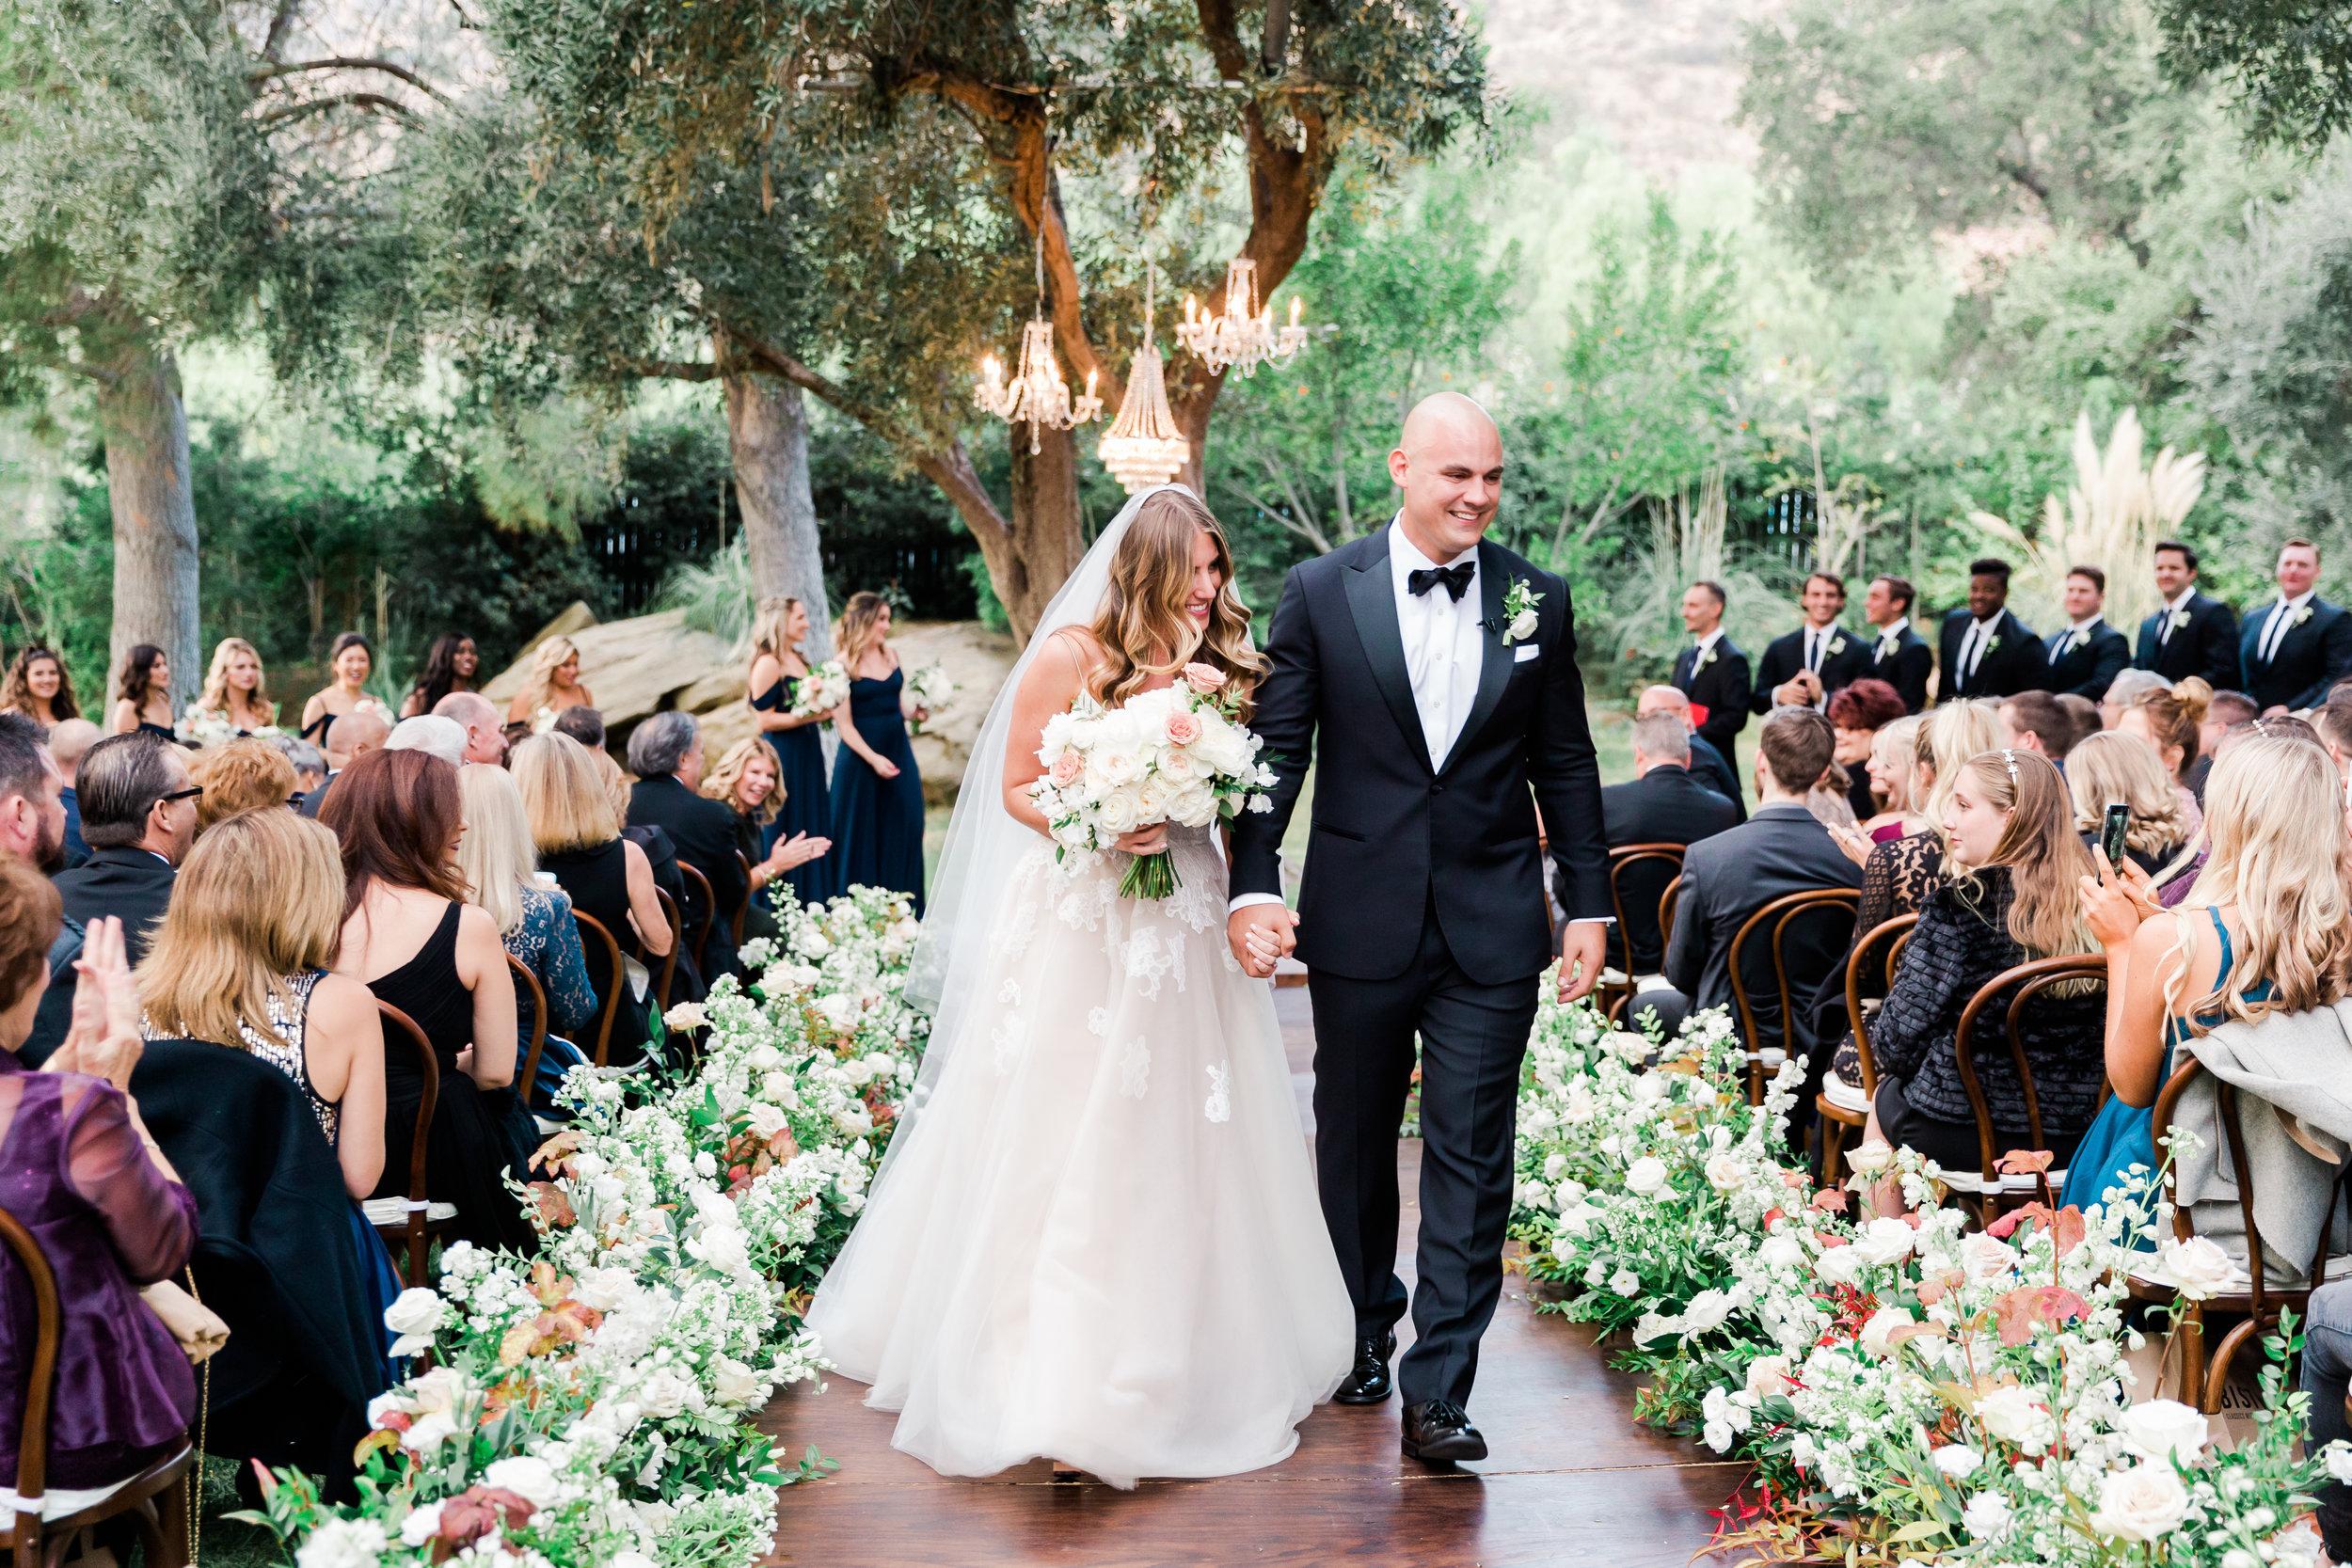 Hummingbird Nest Ranch Wedding _ Valorie Darling Photography_020B0365.jpg